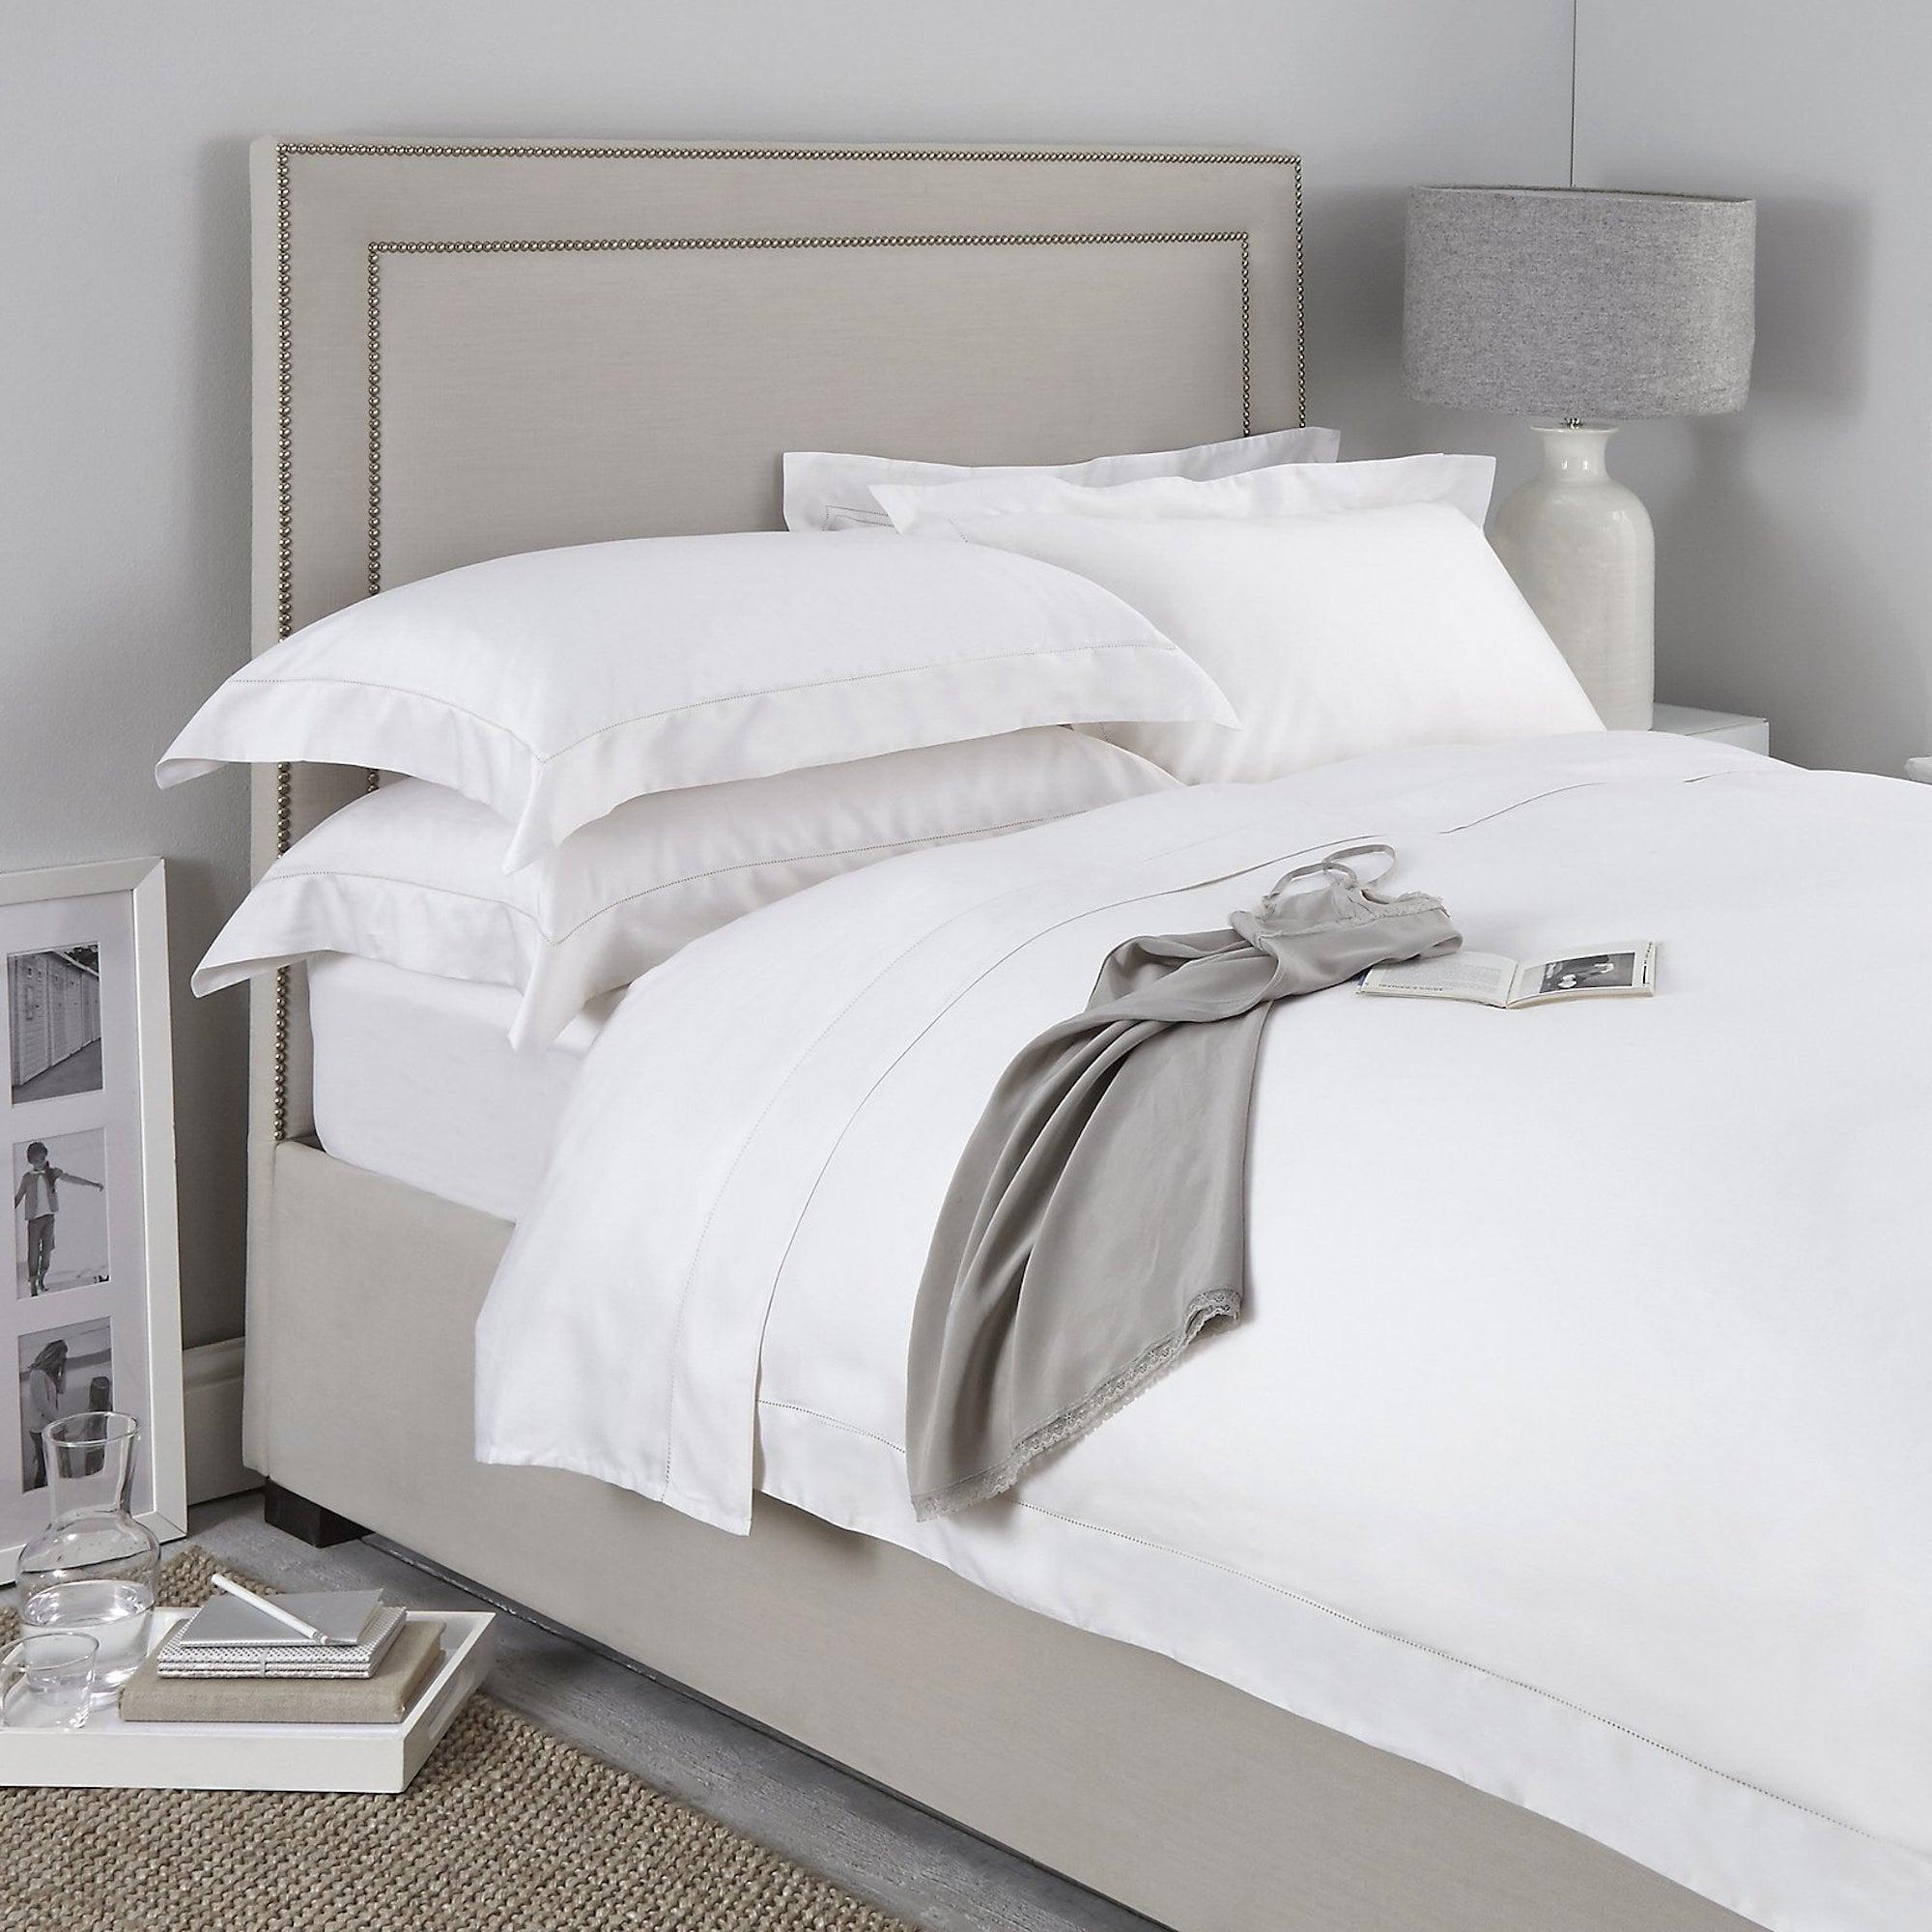 Linen Union 55% Linen/45% Cotton Fitted Sheet